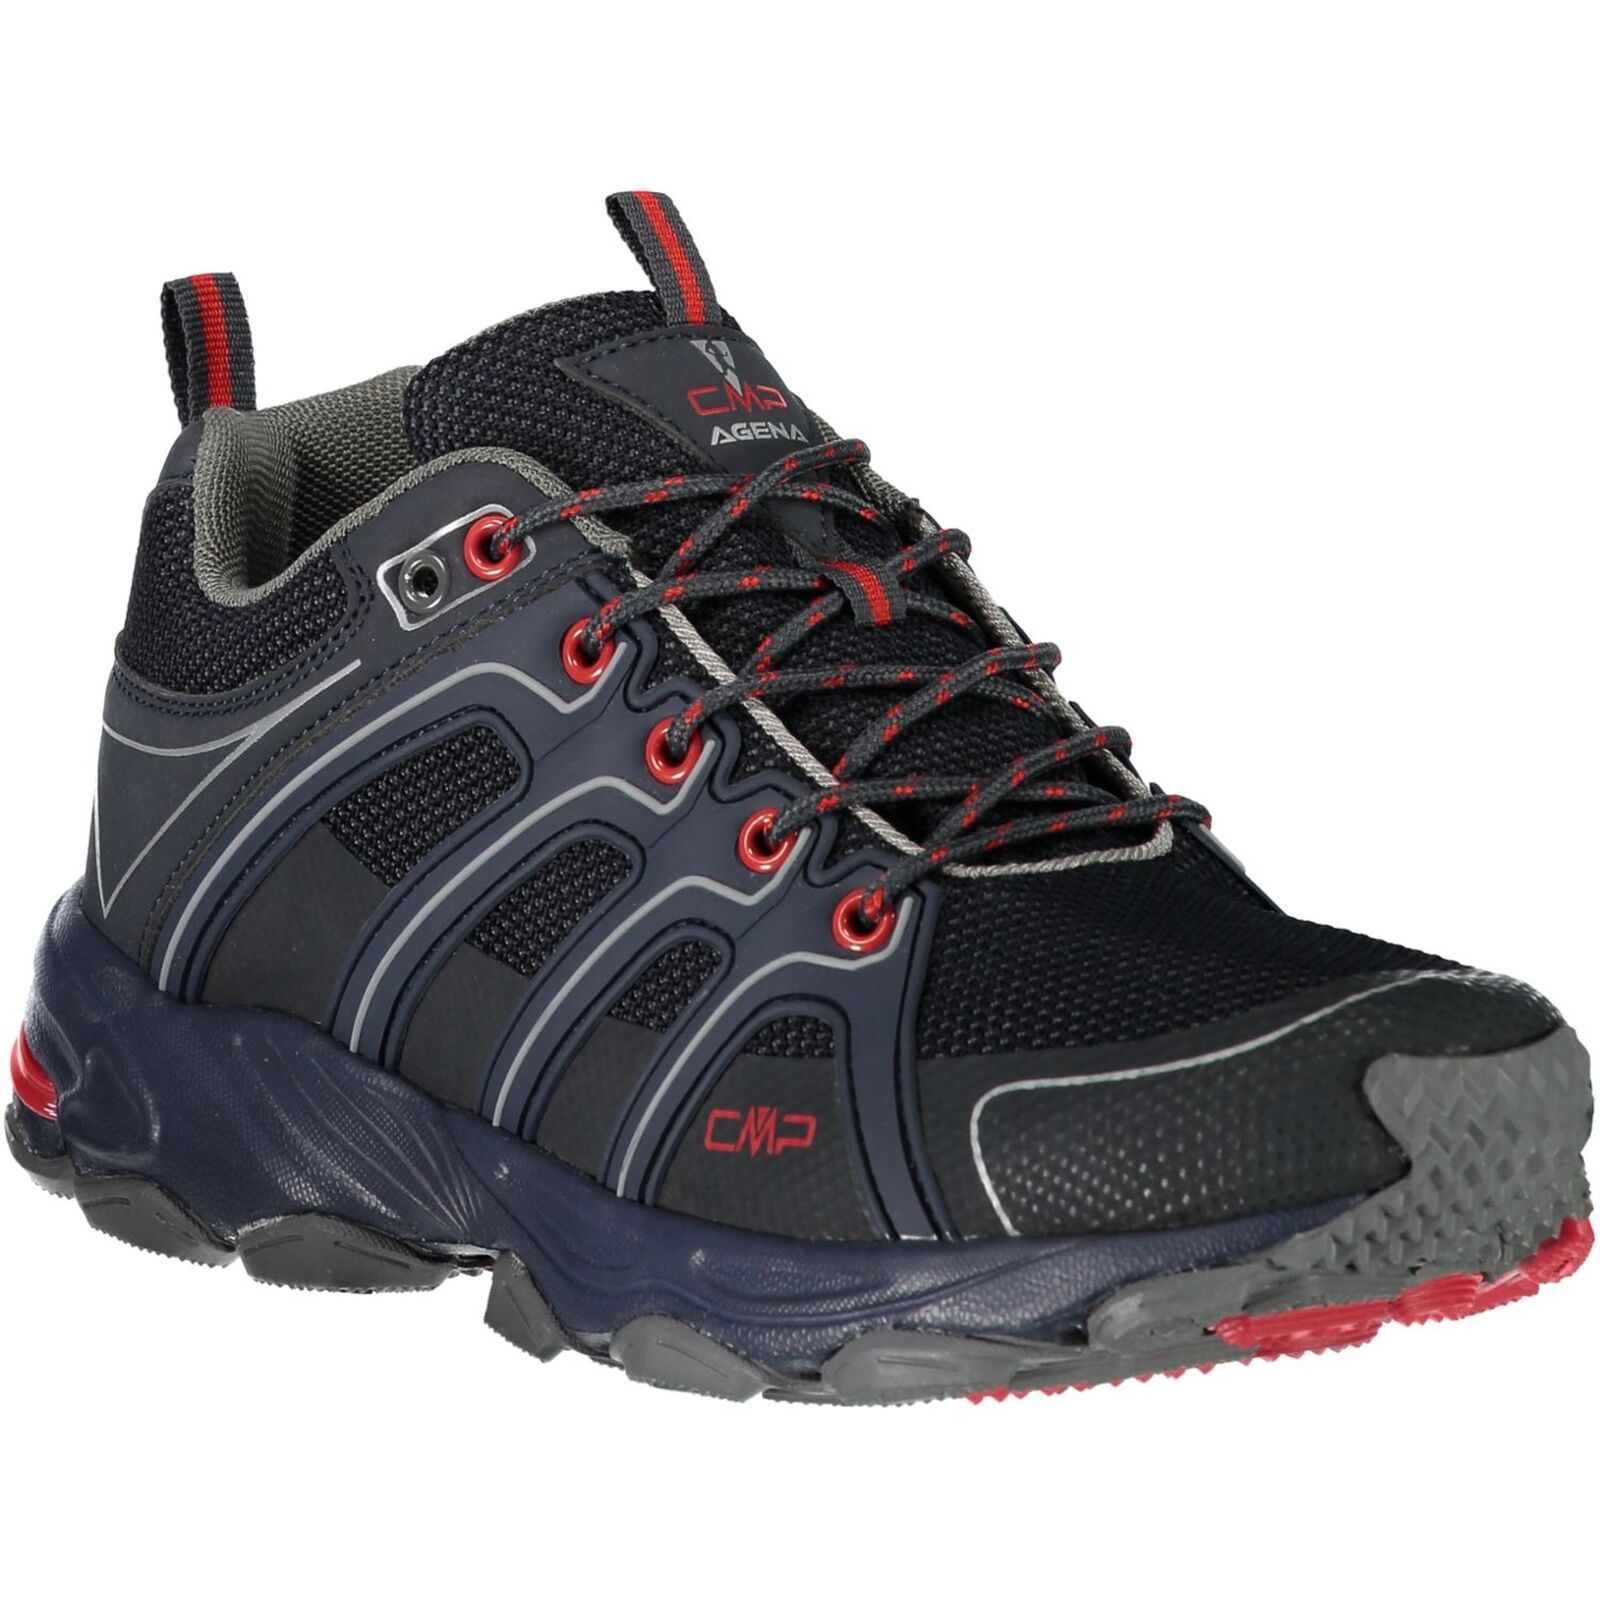 CMP shoes da Corsa Sport Agena Trail shoes Wp grey  Pianura Misto  best offer